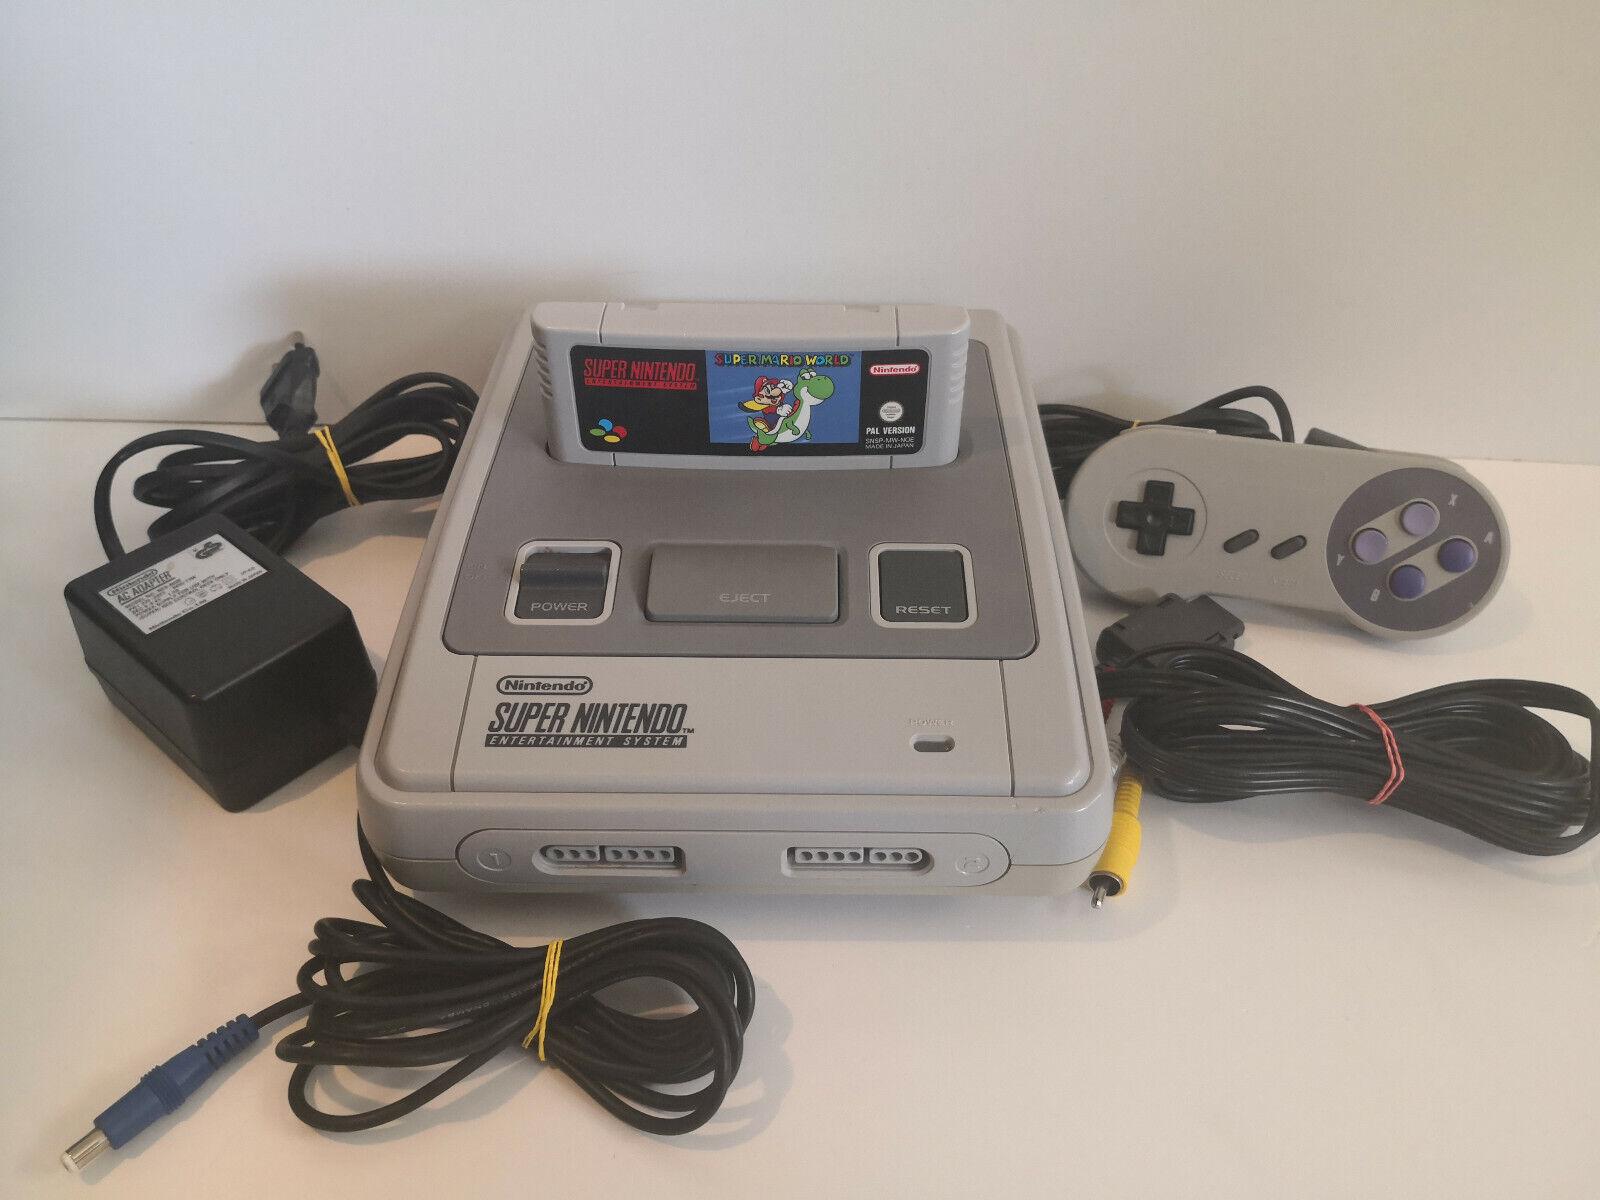 videogiochi e console: Super Nintendo Snes Konsole (verschiedene Varianten), optional mit HDMI